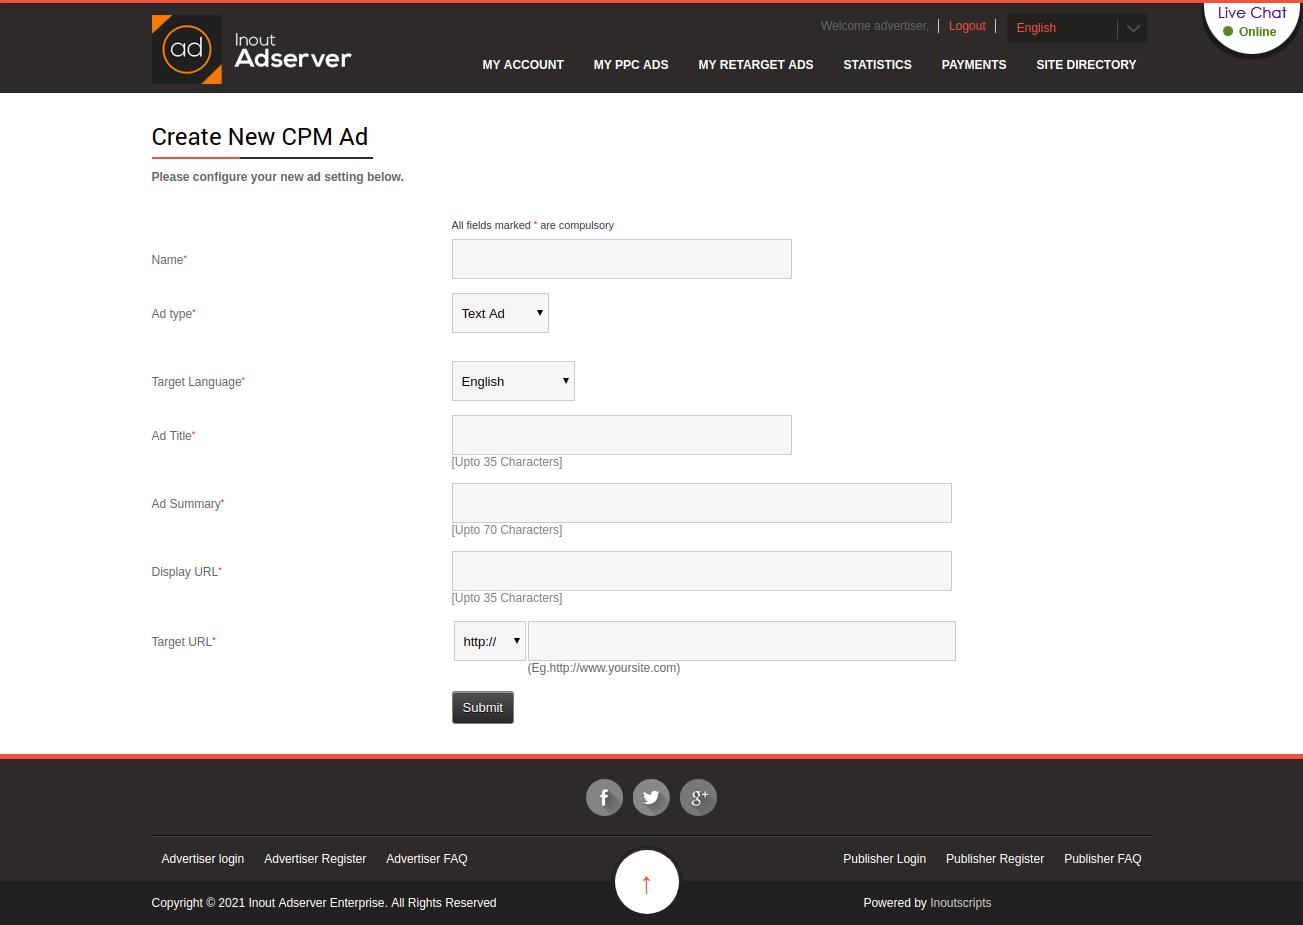 Cost Per Impression (CPM) Ads (for Inout Adserver) - Screenshot 3